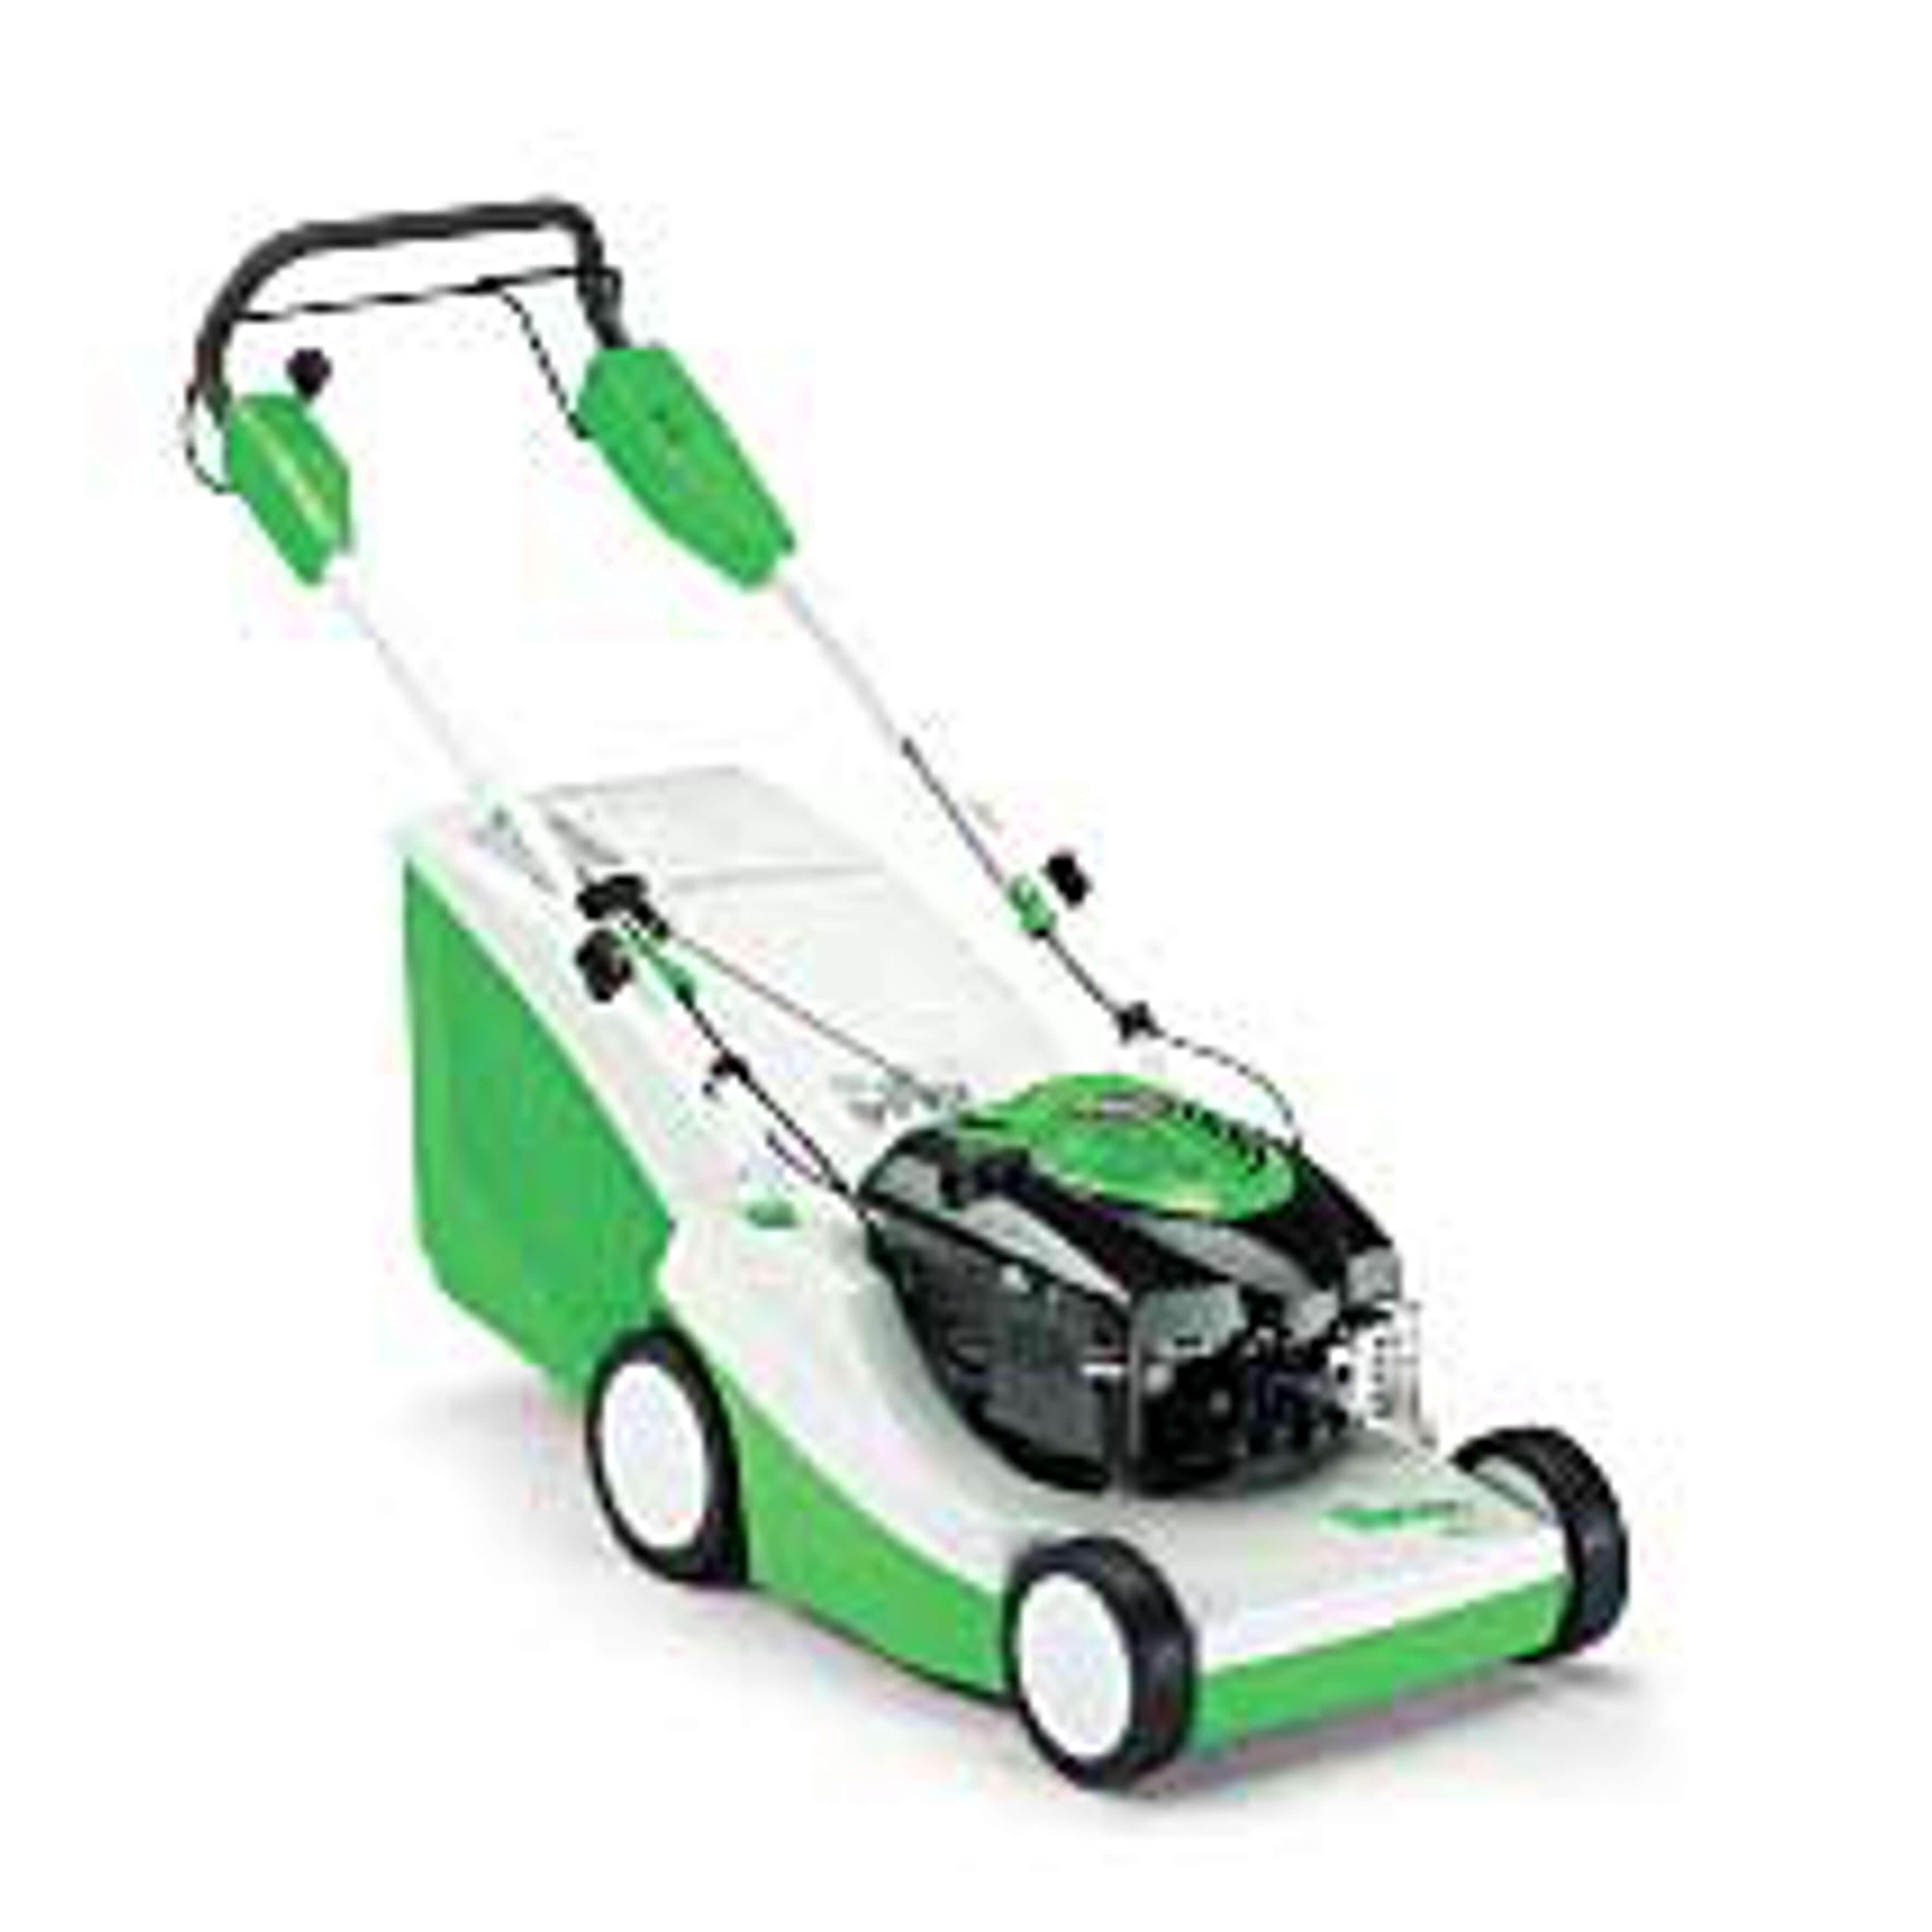 Viking MB 500 Petrol Lawn Mower